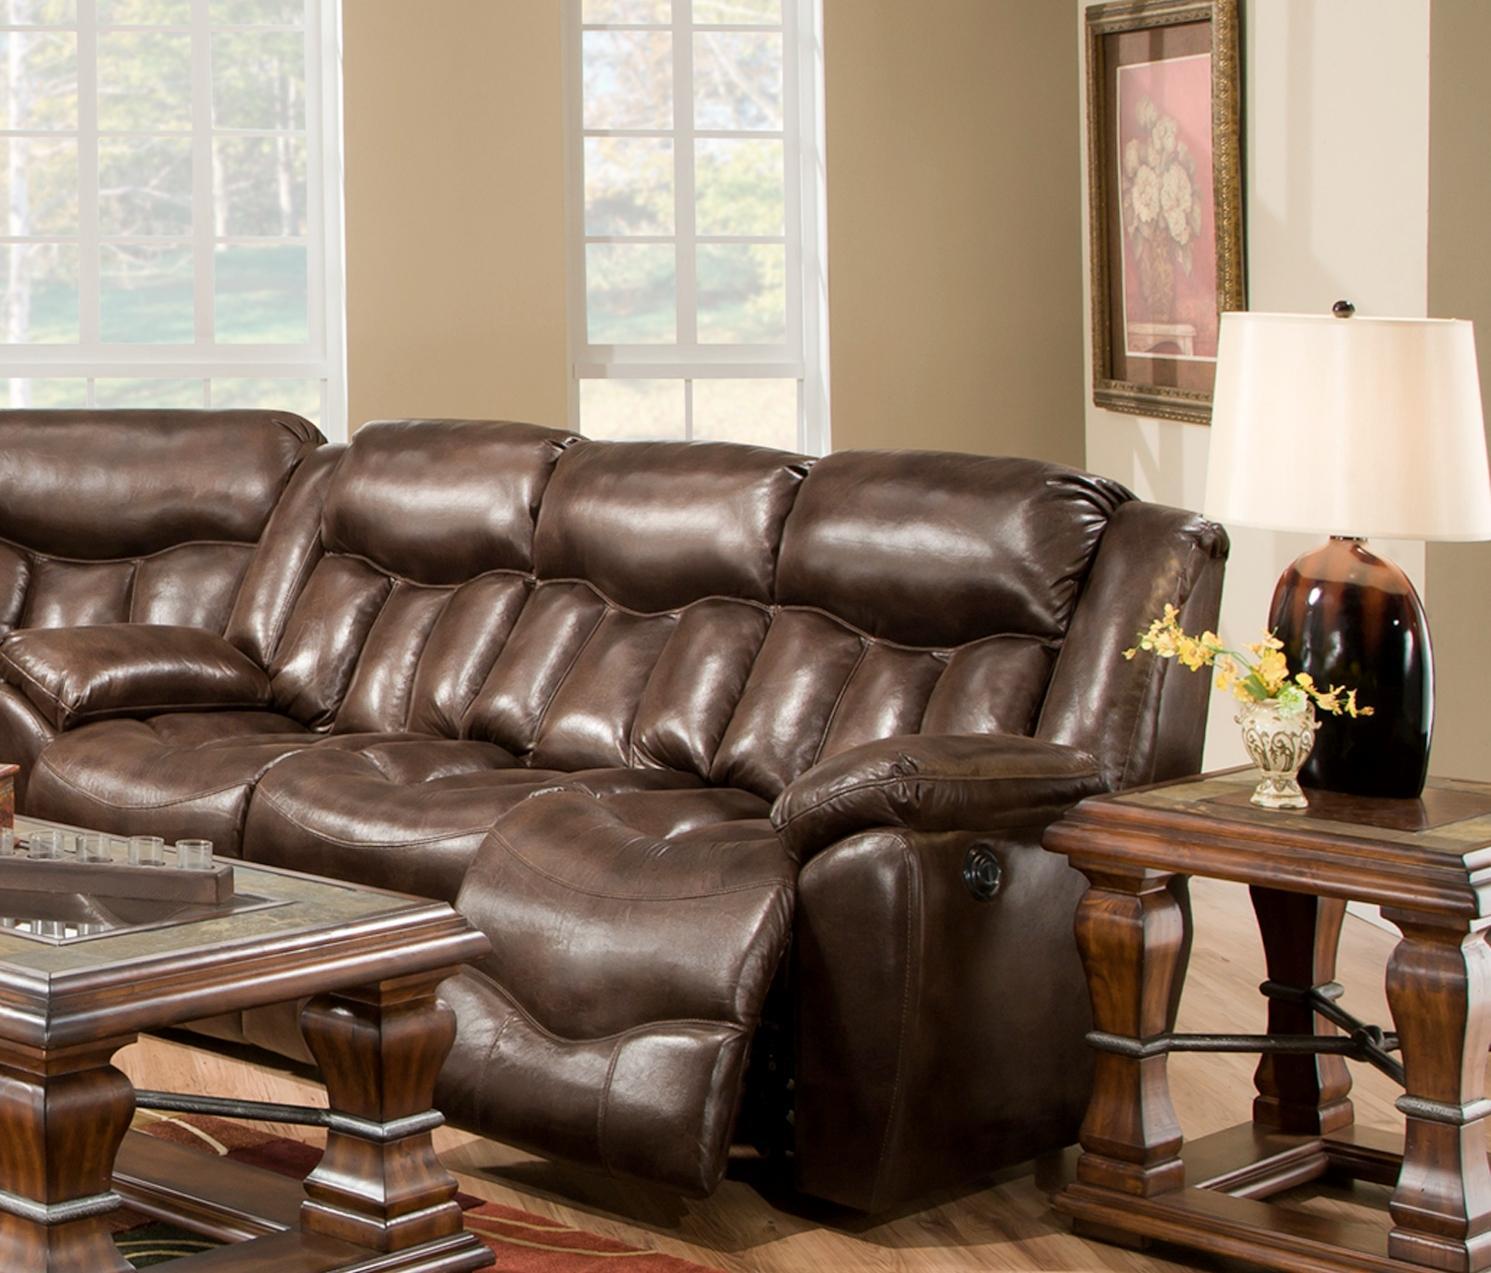 Franklin 564 Reclining Sofa Miskelly Furniture Reclining Sofa